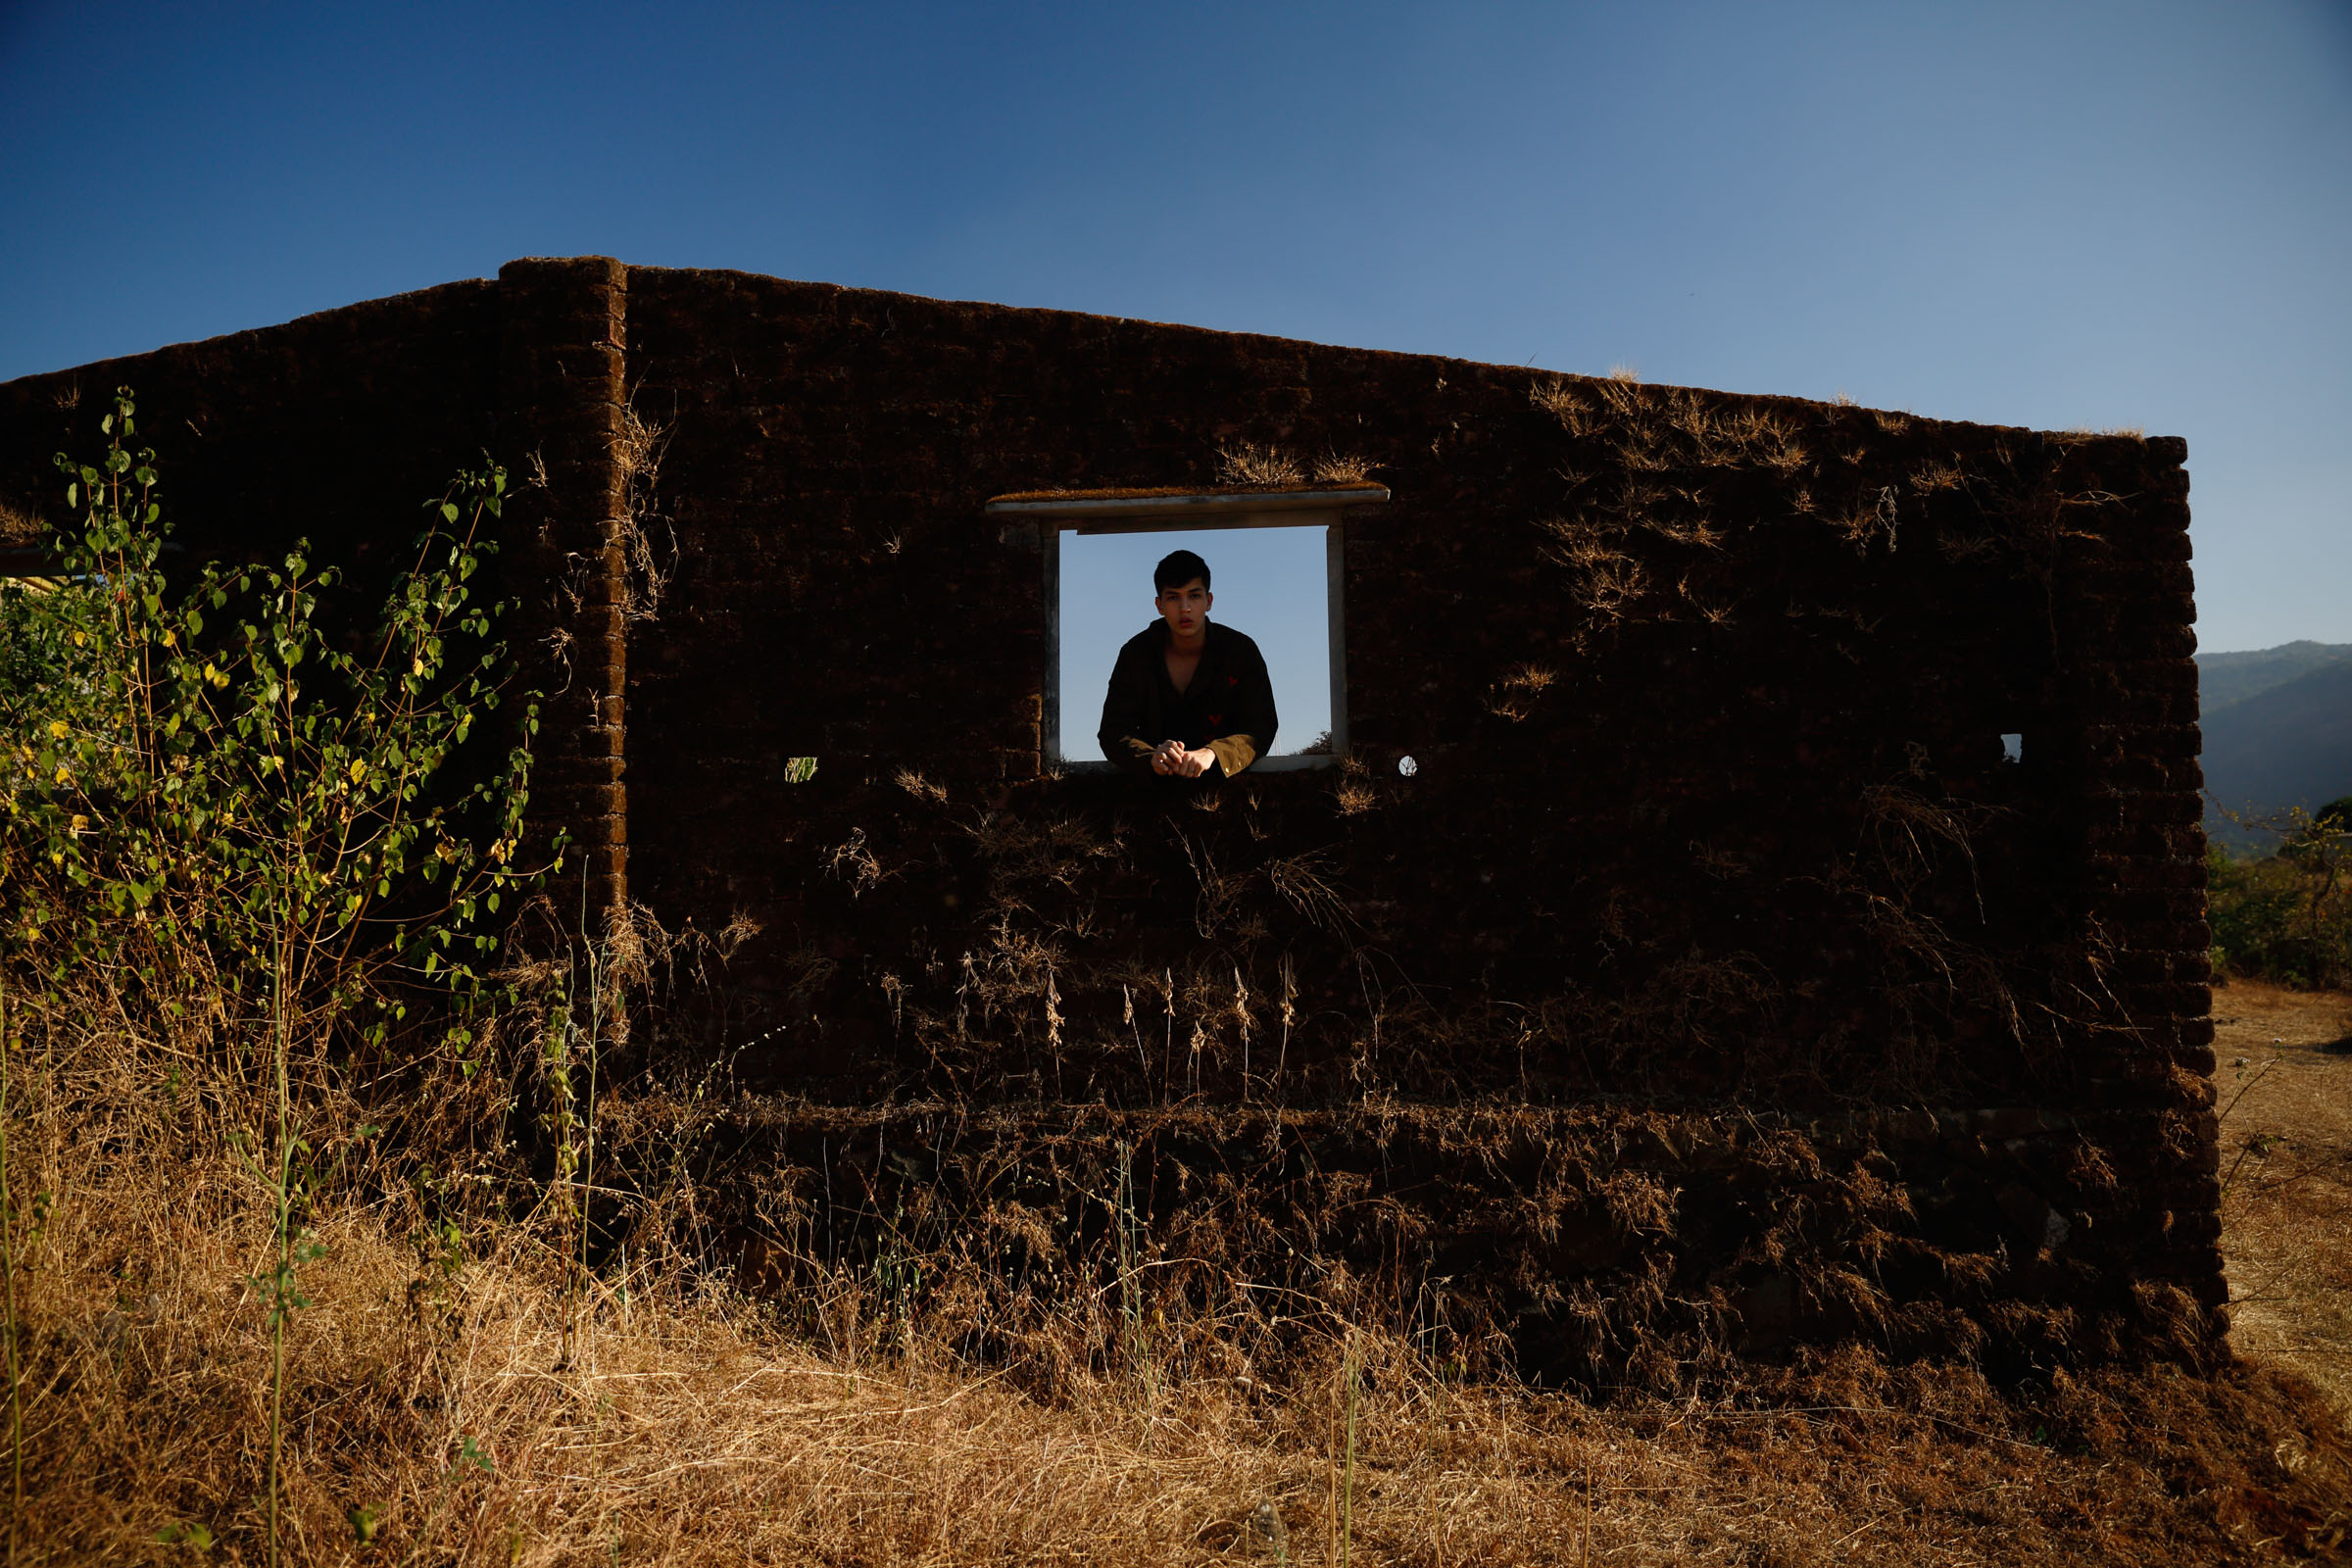 Kriator-Photographer-Country Roads_15.jpg